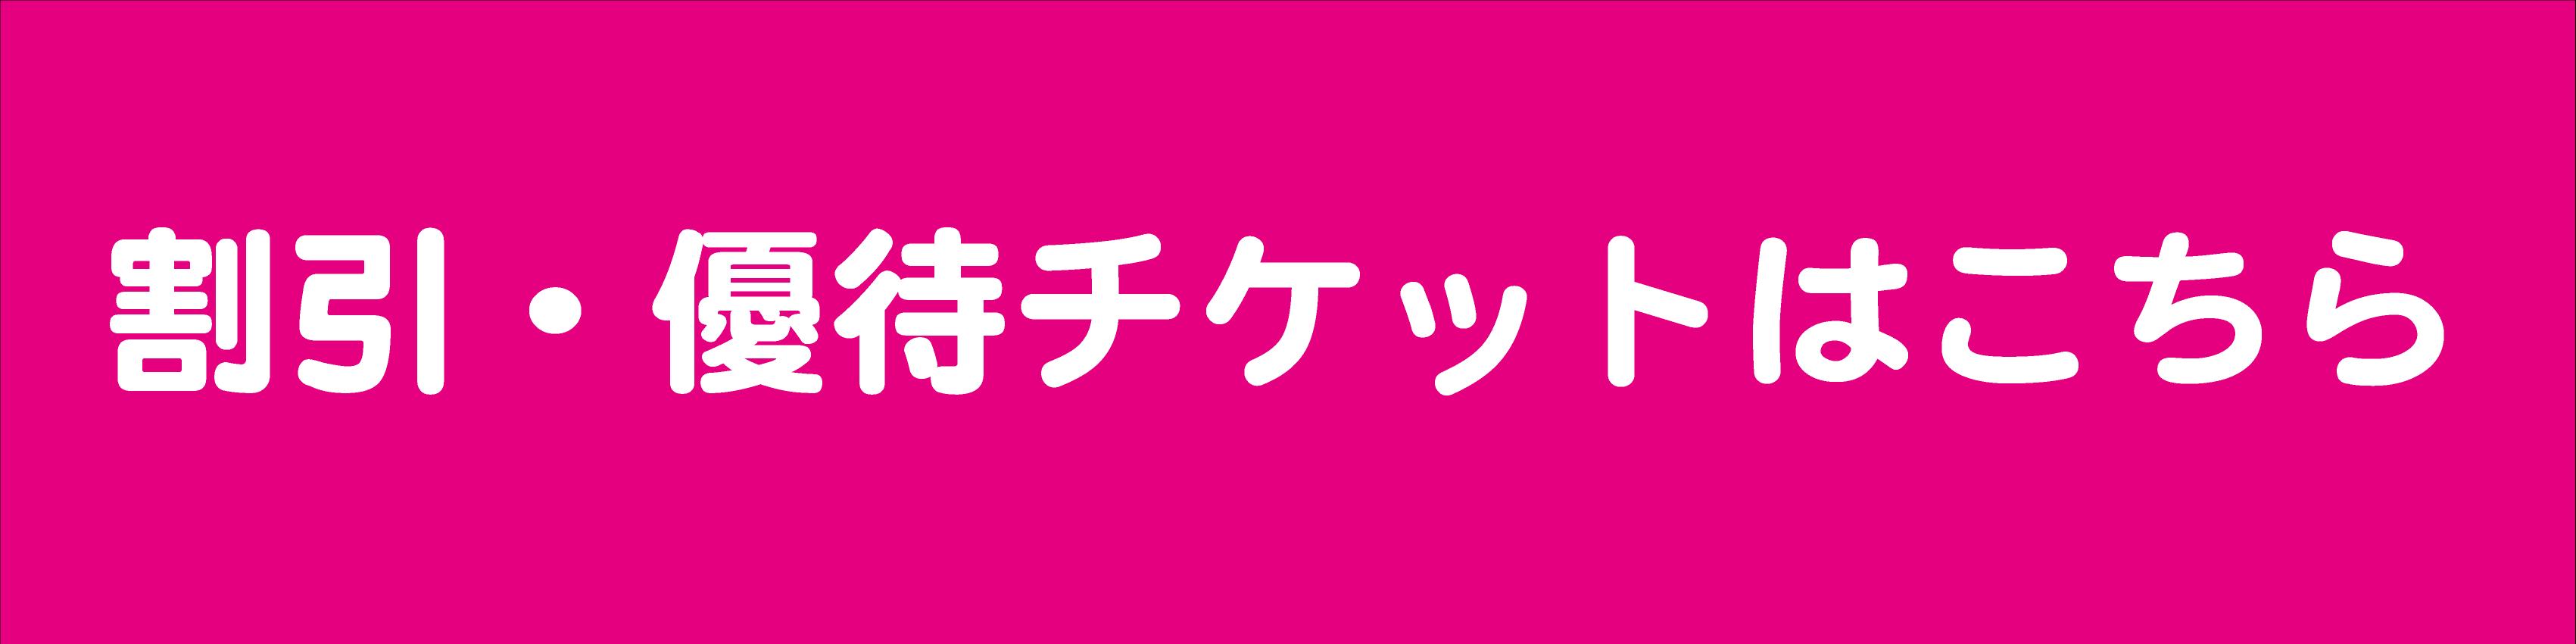 http://artconsultant.yokohama/musicalplay2017-discount/